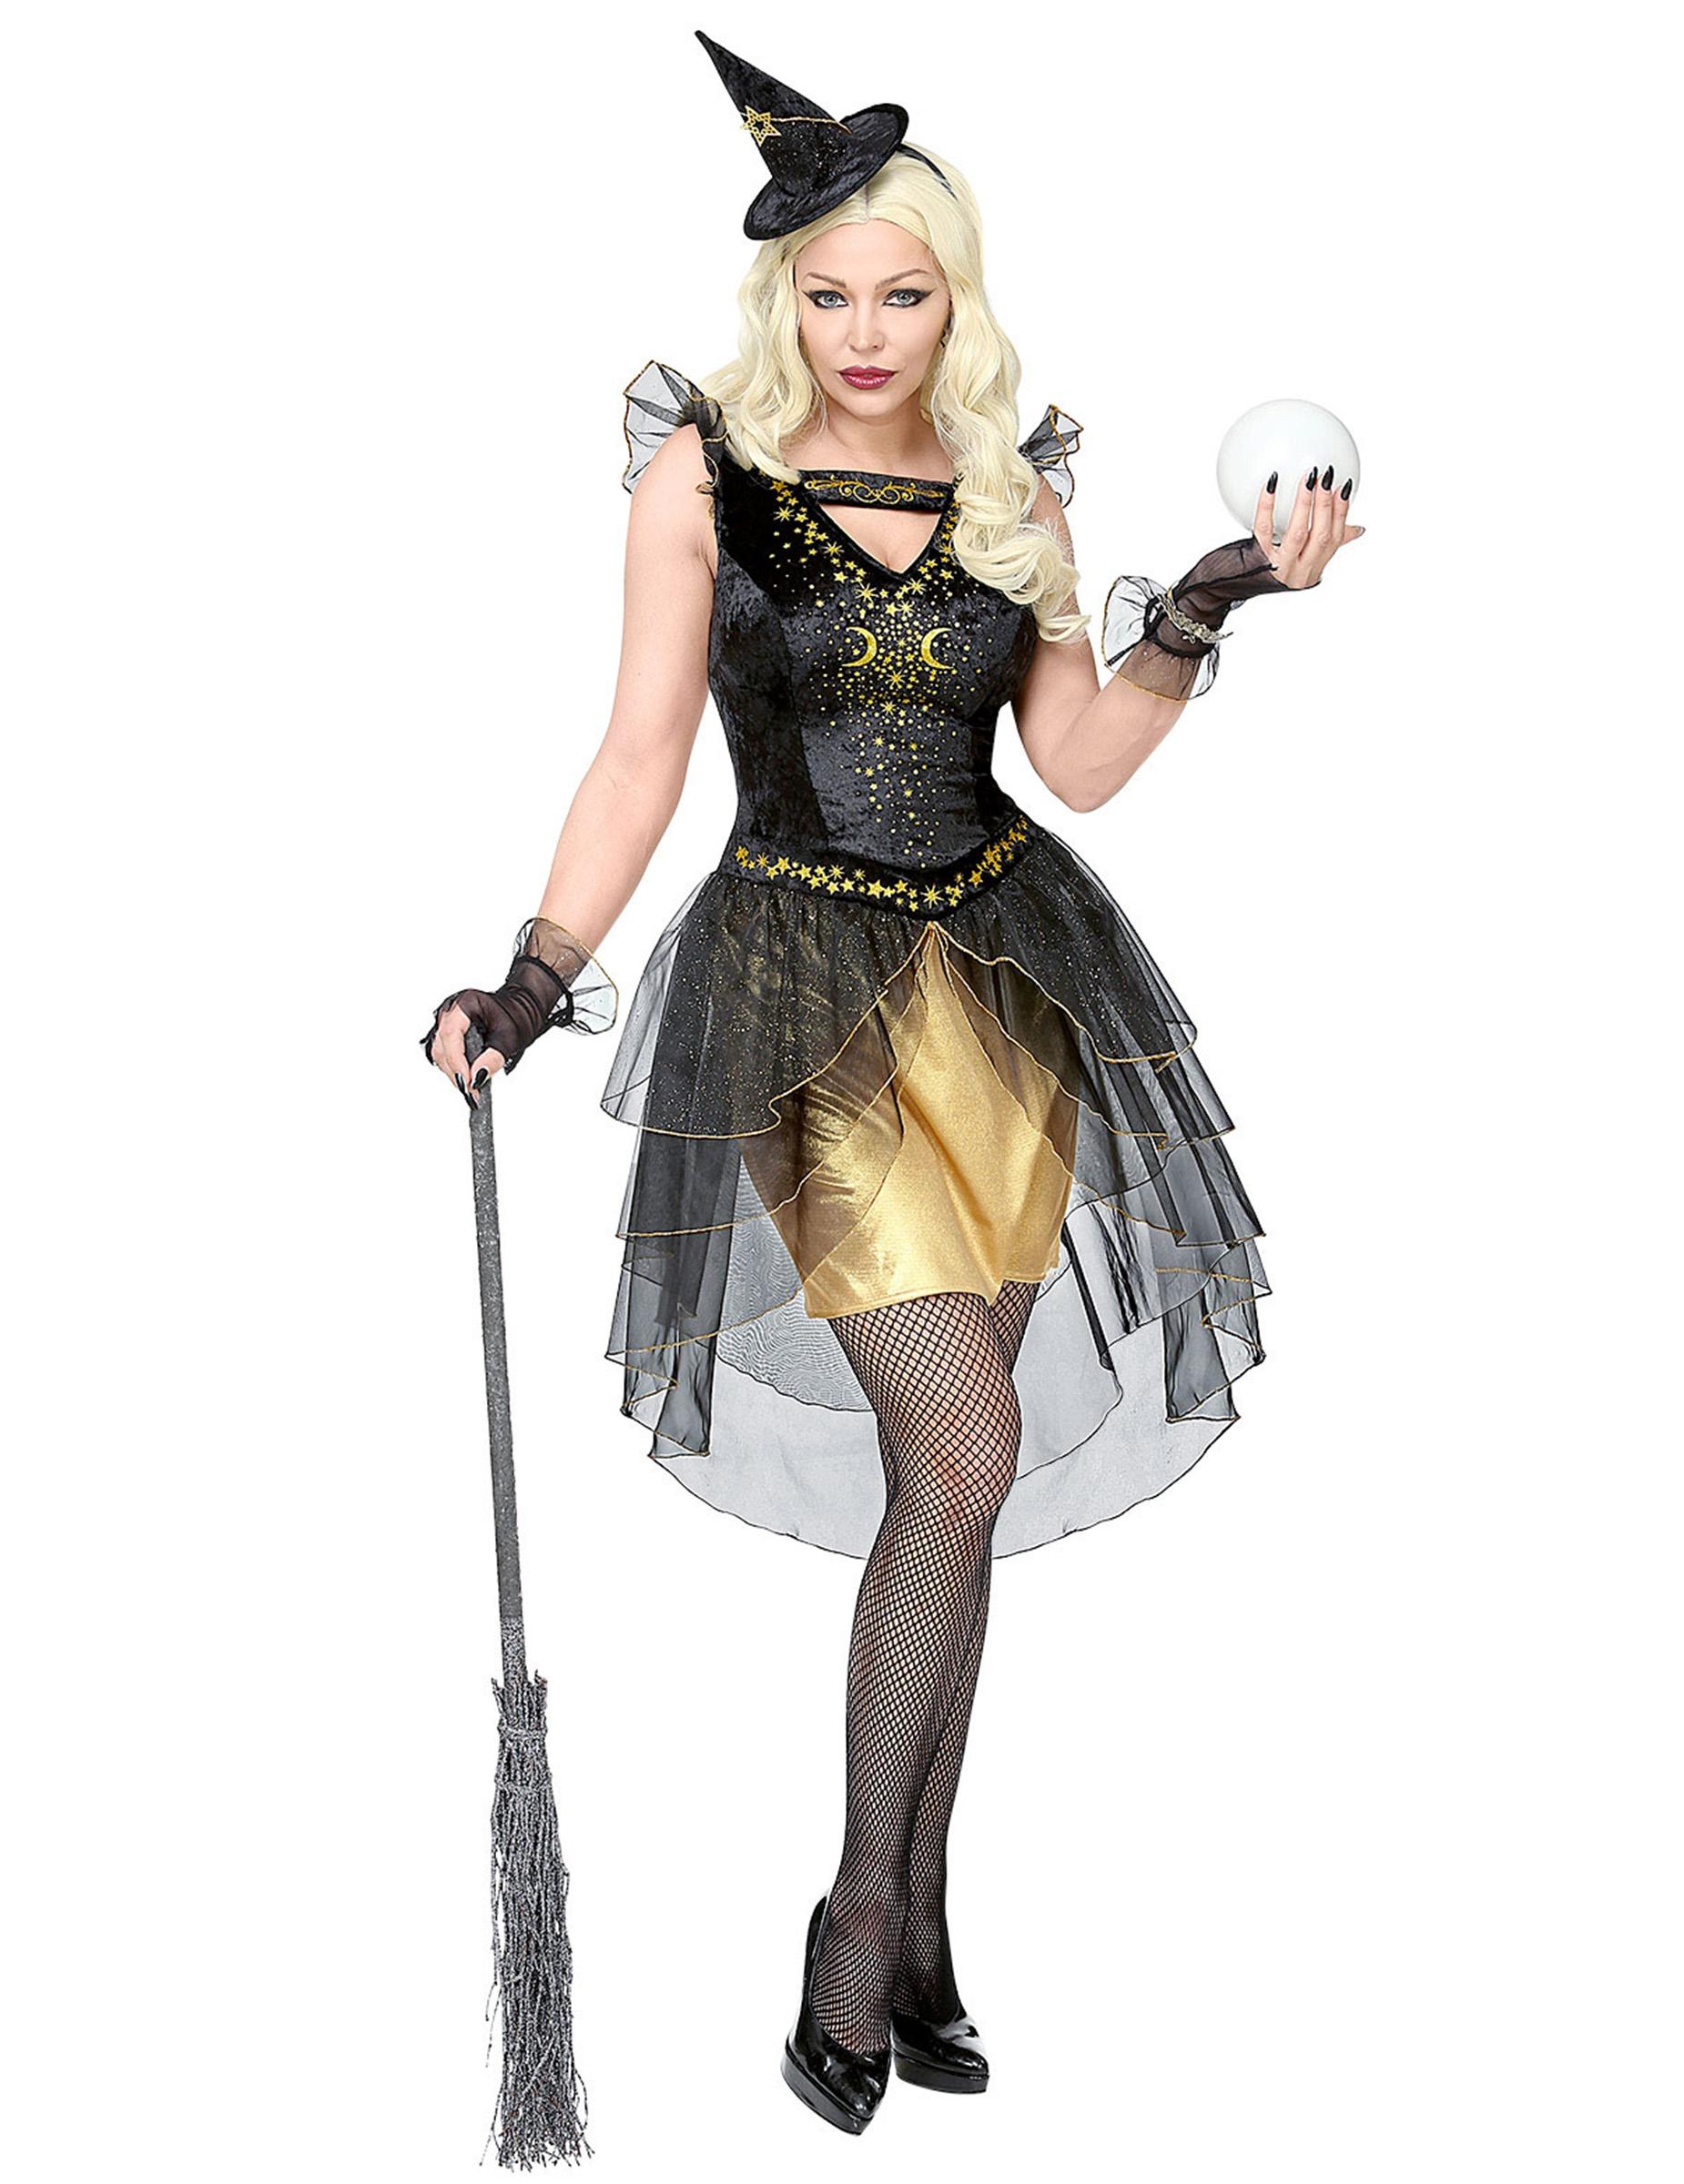 Halloween 3er Kostuem.Kleidung Accessoires Kostume Verkleidungen Halloween Outfit Damen Cosplay Vampir Kostum Evil Hexen Zauberin Karneval Party